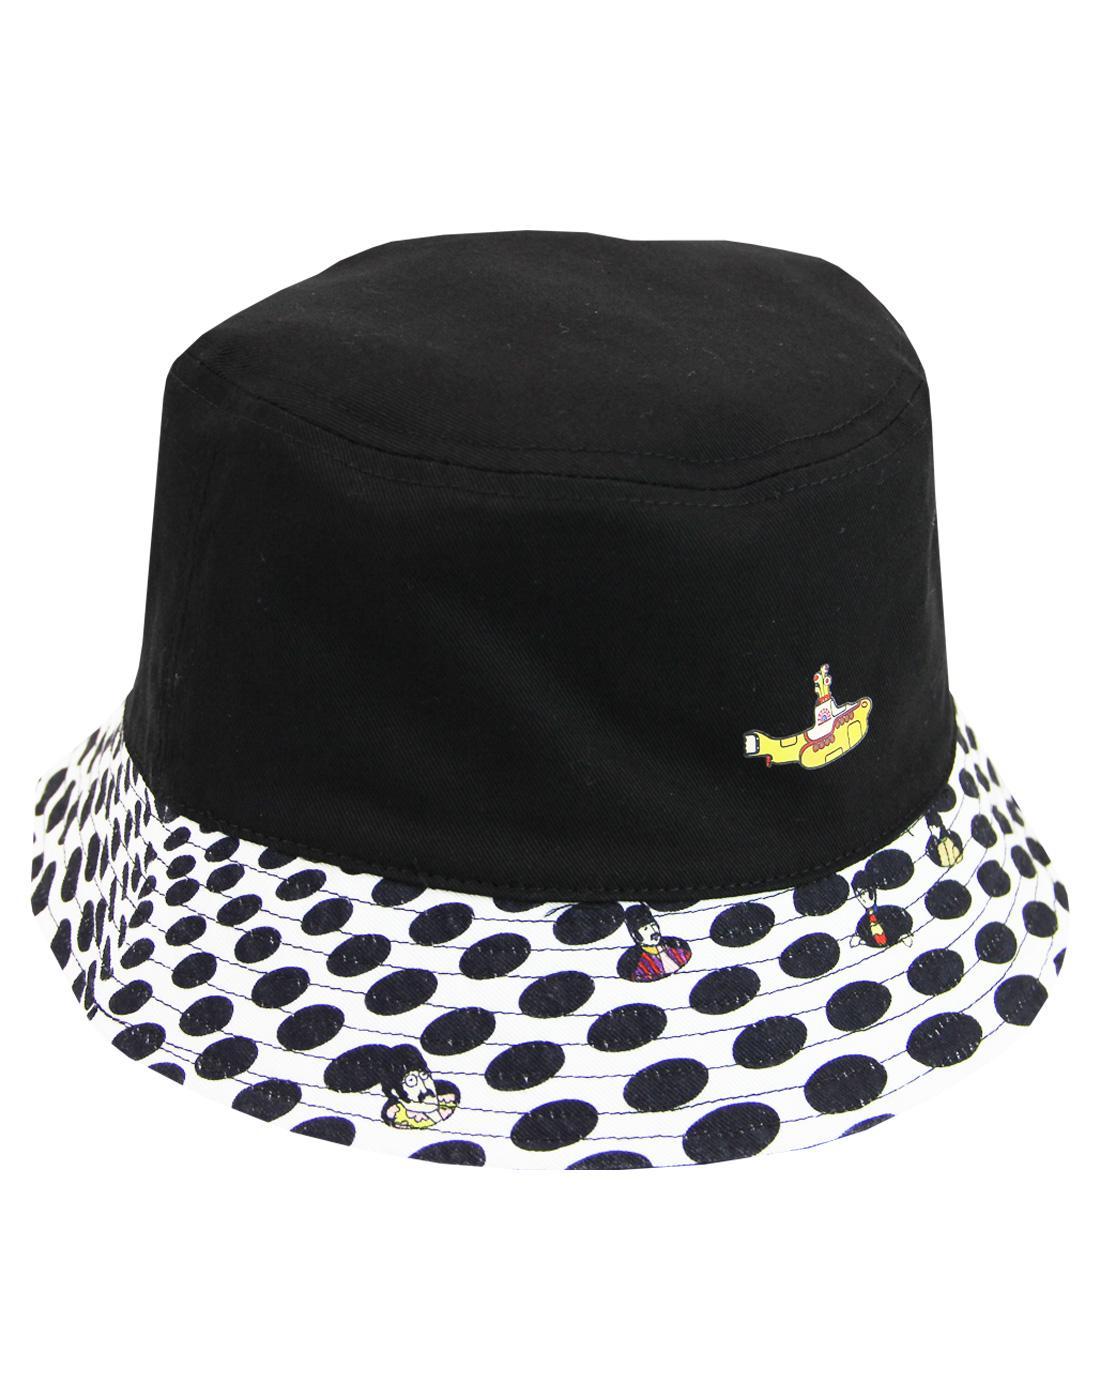 PRETTY GREEN x THE BEATLES Sea Of Holes Bucket Hat